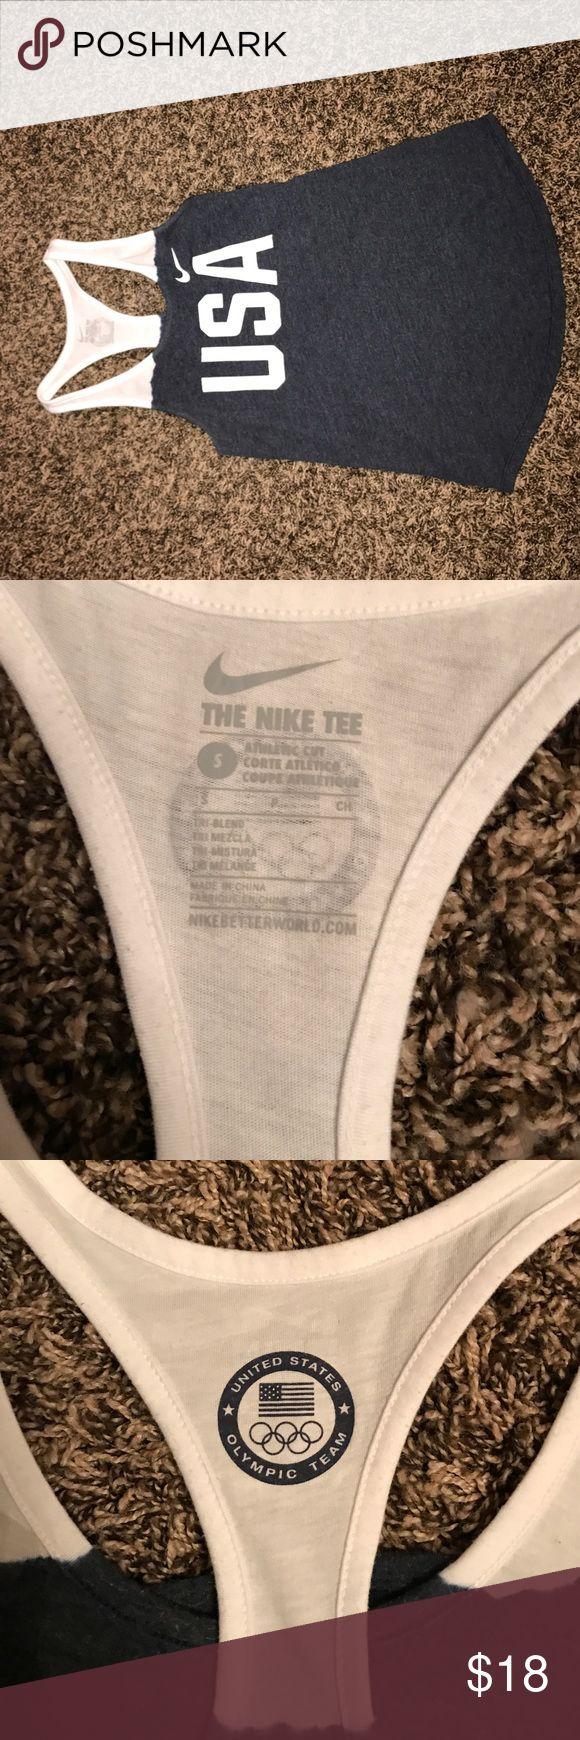 USA nike tank top USA nike tank top. size small. never worn. perfect condition Nike Tops Tank Tops